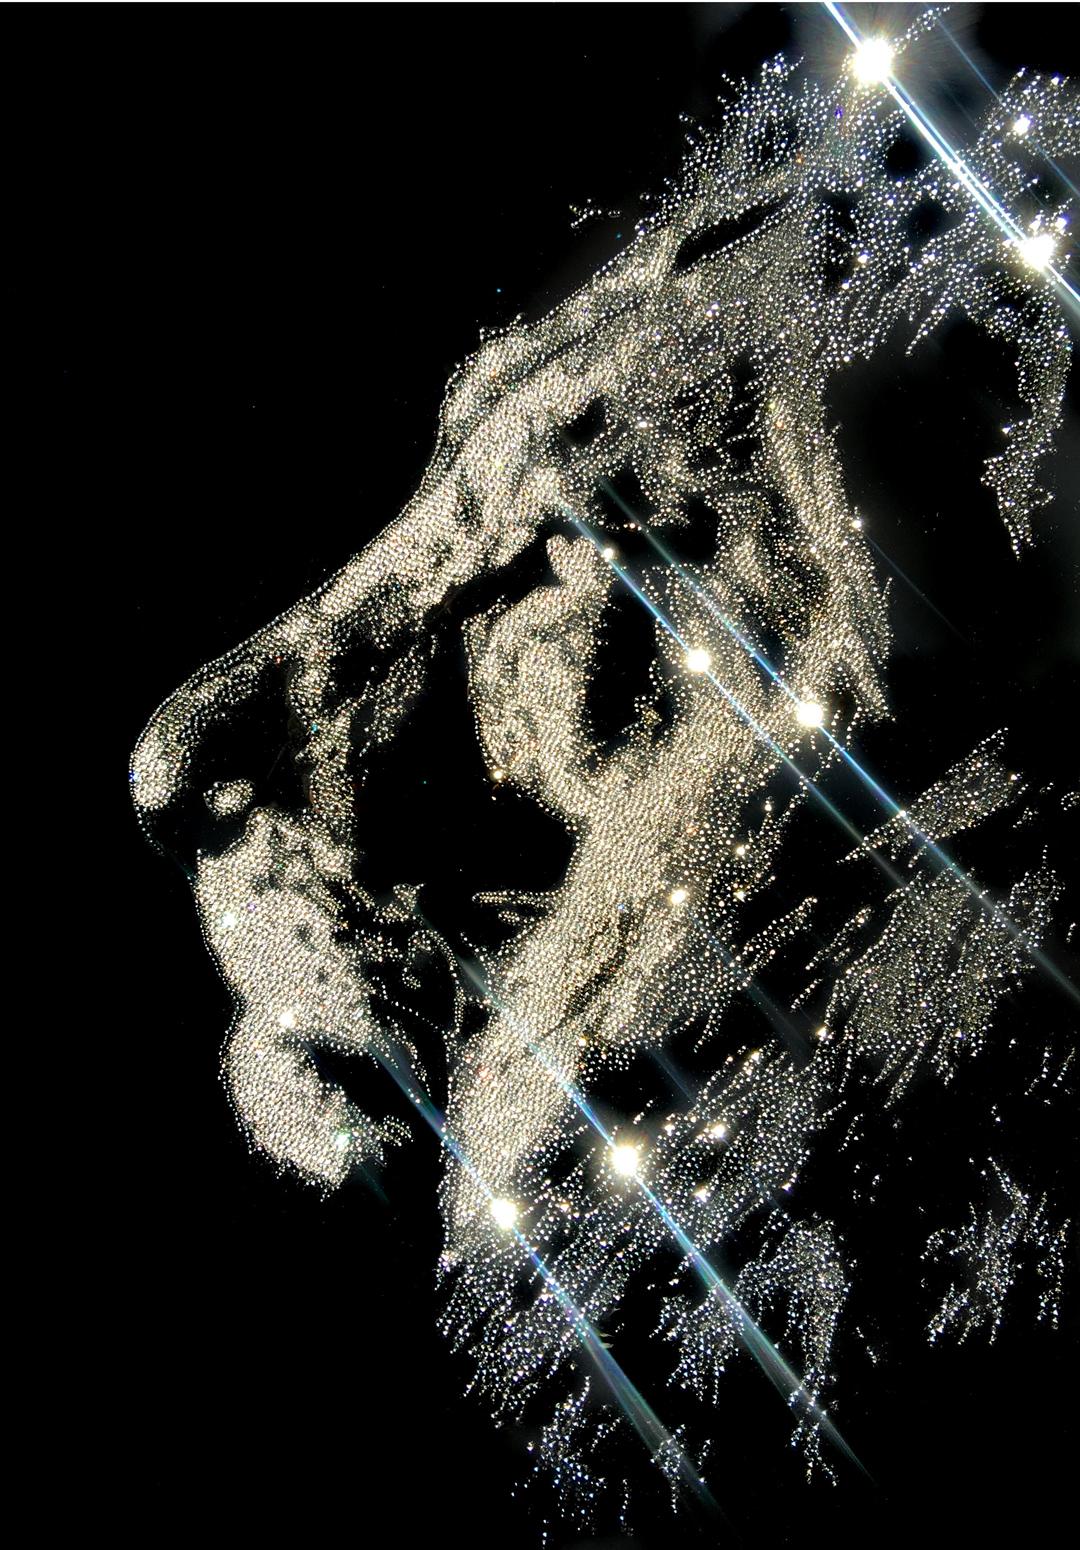 Thinking About You, 20300 Crystals from Swarovski® su plexiglass, 85x60 cm. 2017